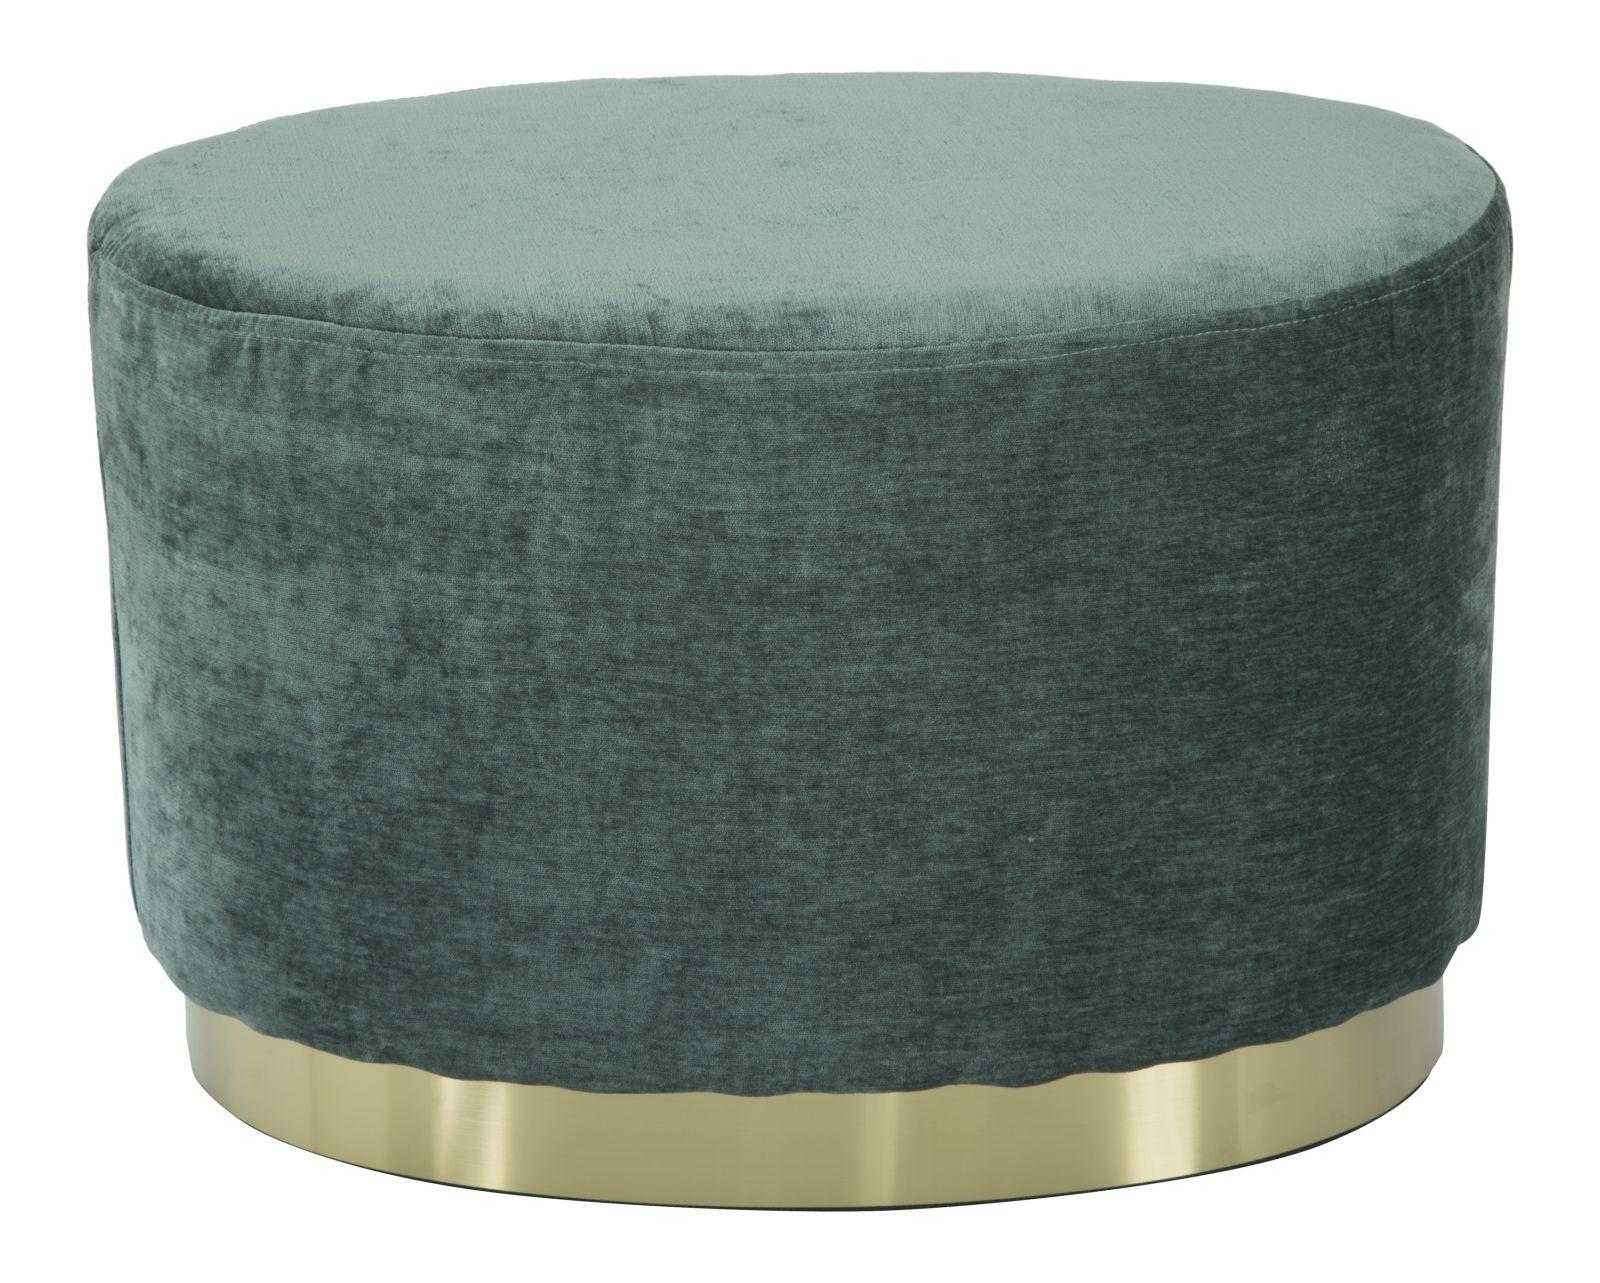 Taburet tapitat cu stofa Goldy Ovale Green l60xA40xH40 cm